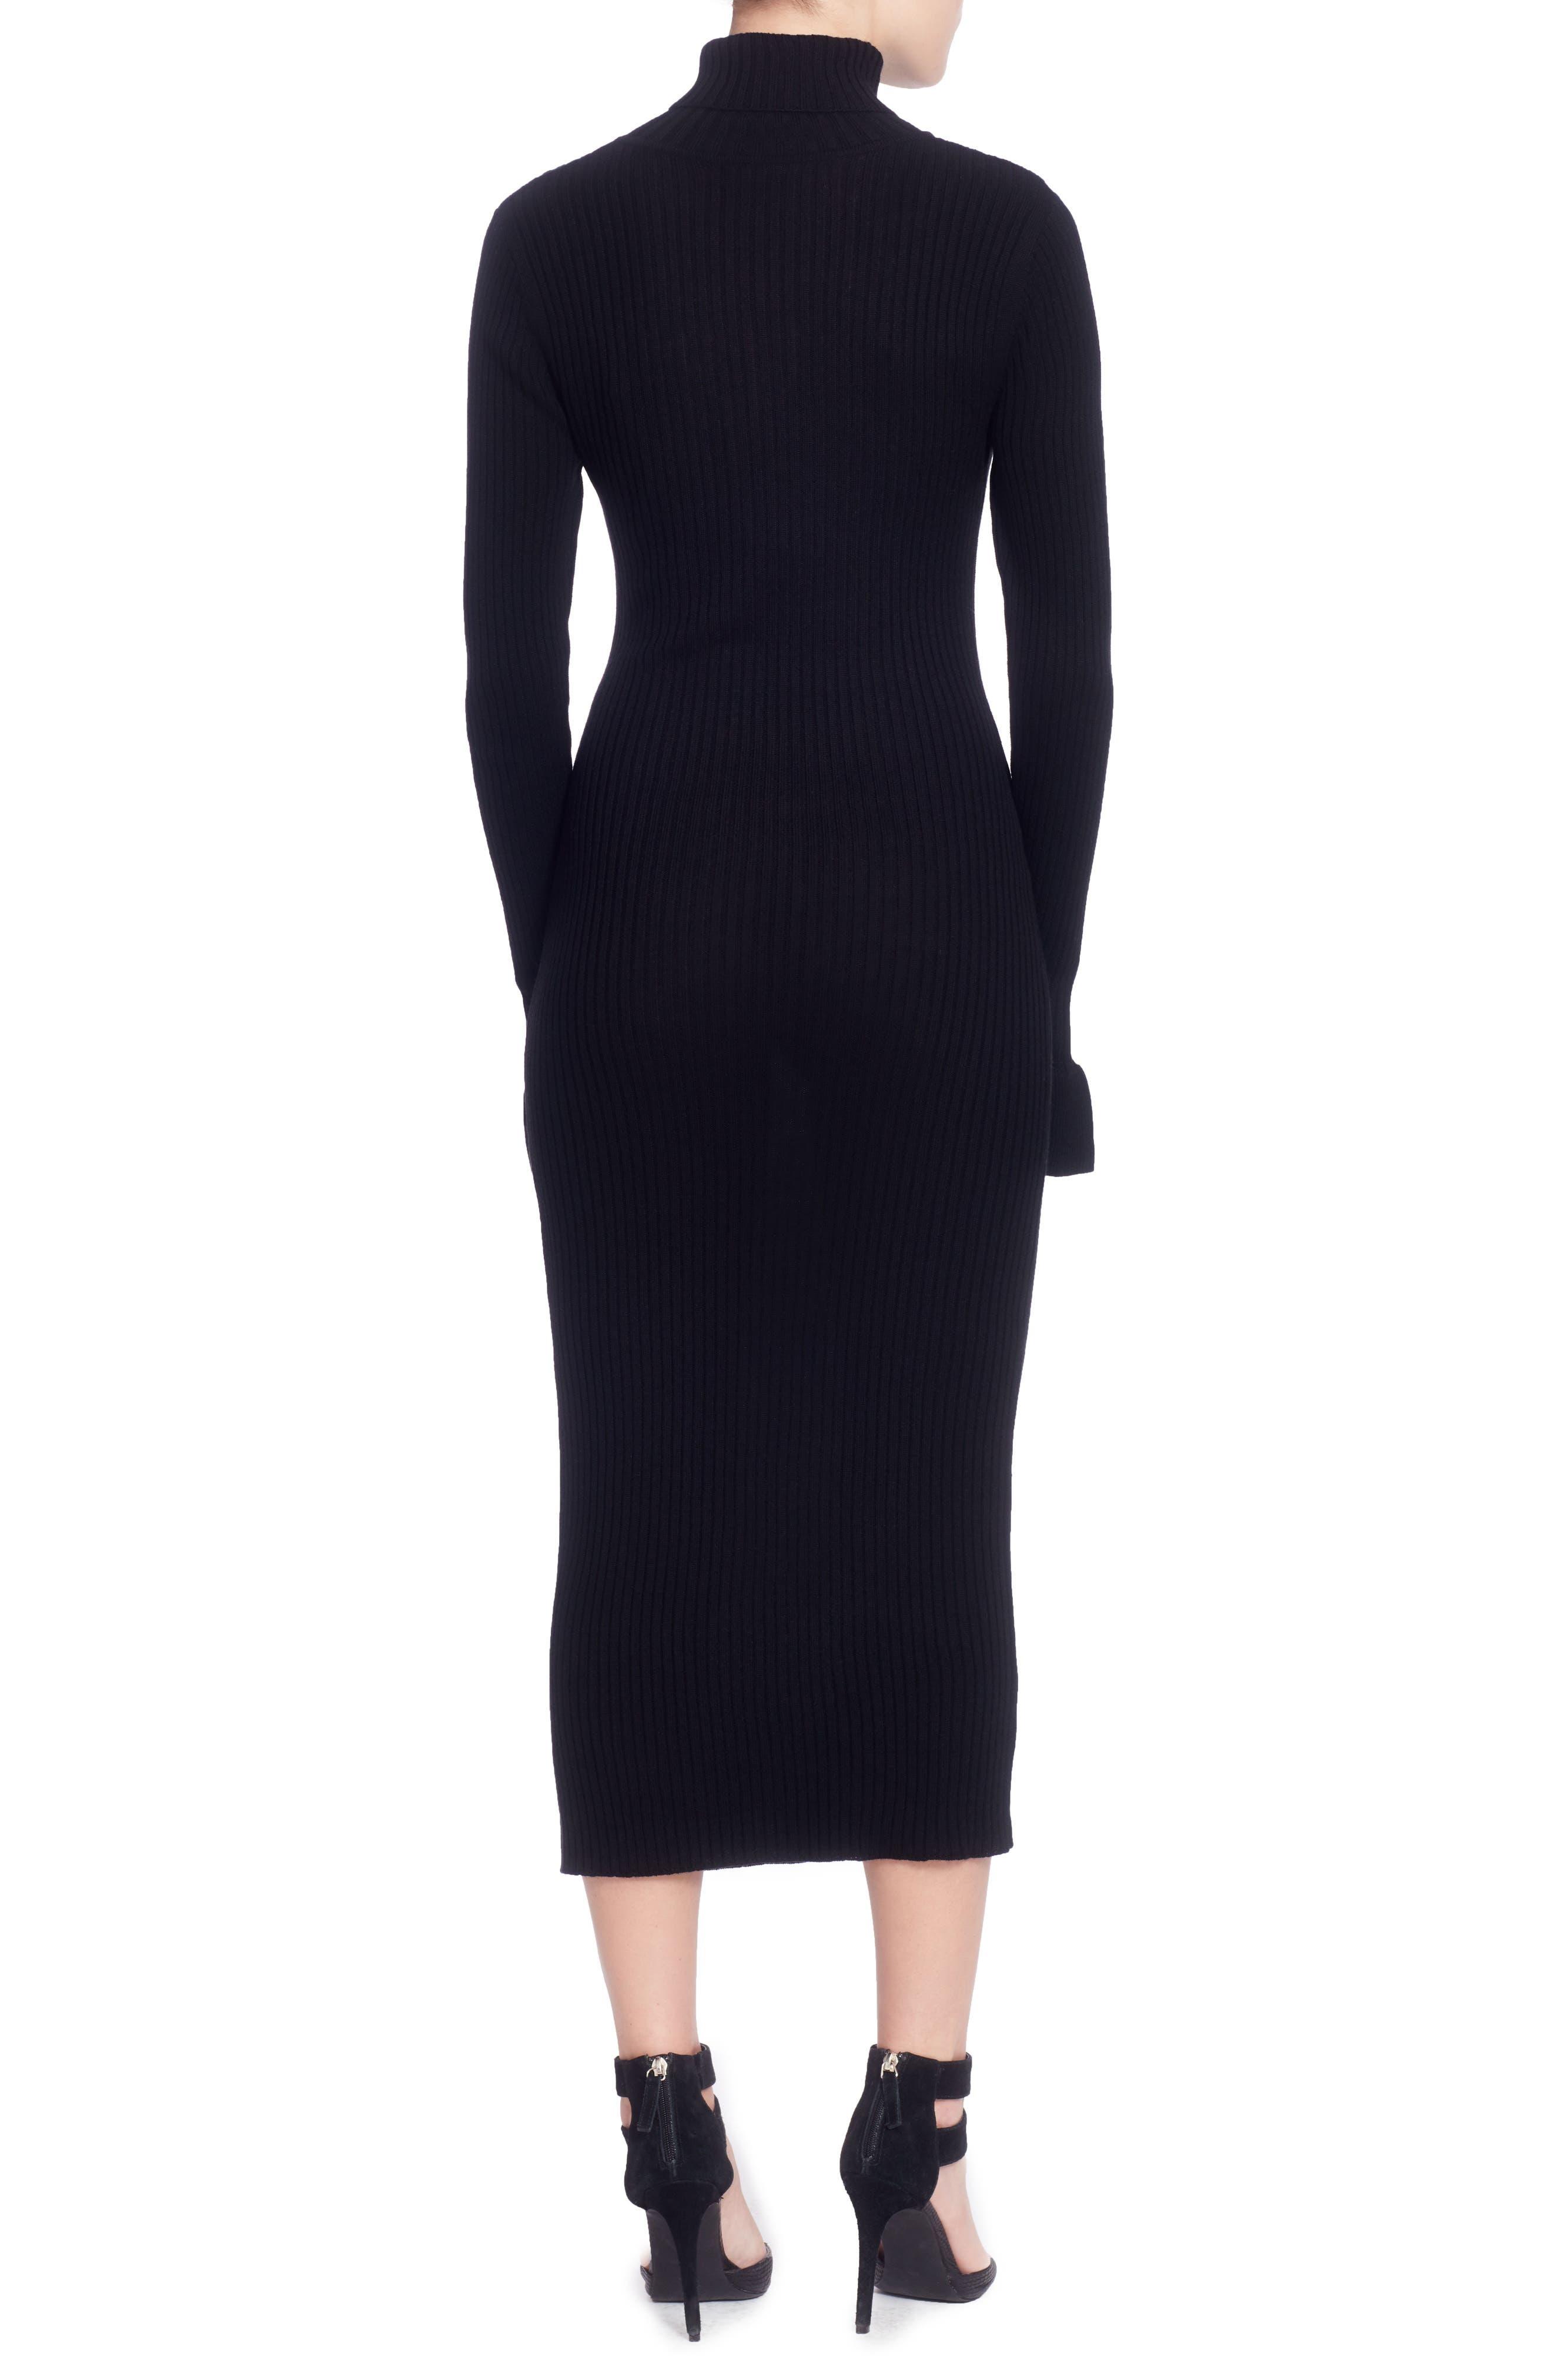 Camron Turtleneck Midi Dress,                             Alternate thumbnail 2, color,                             010